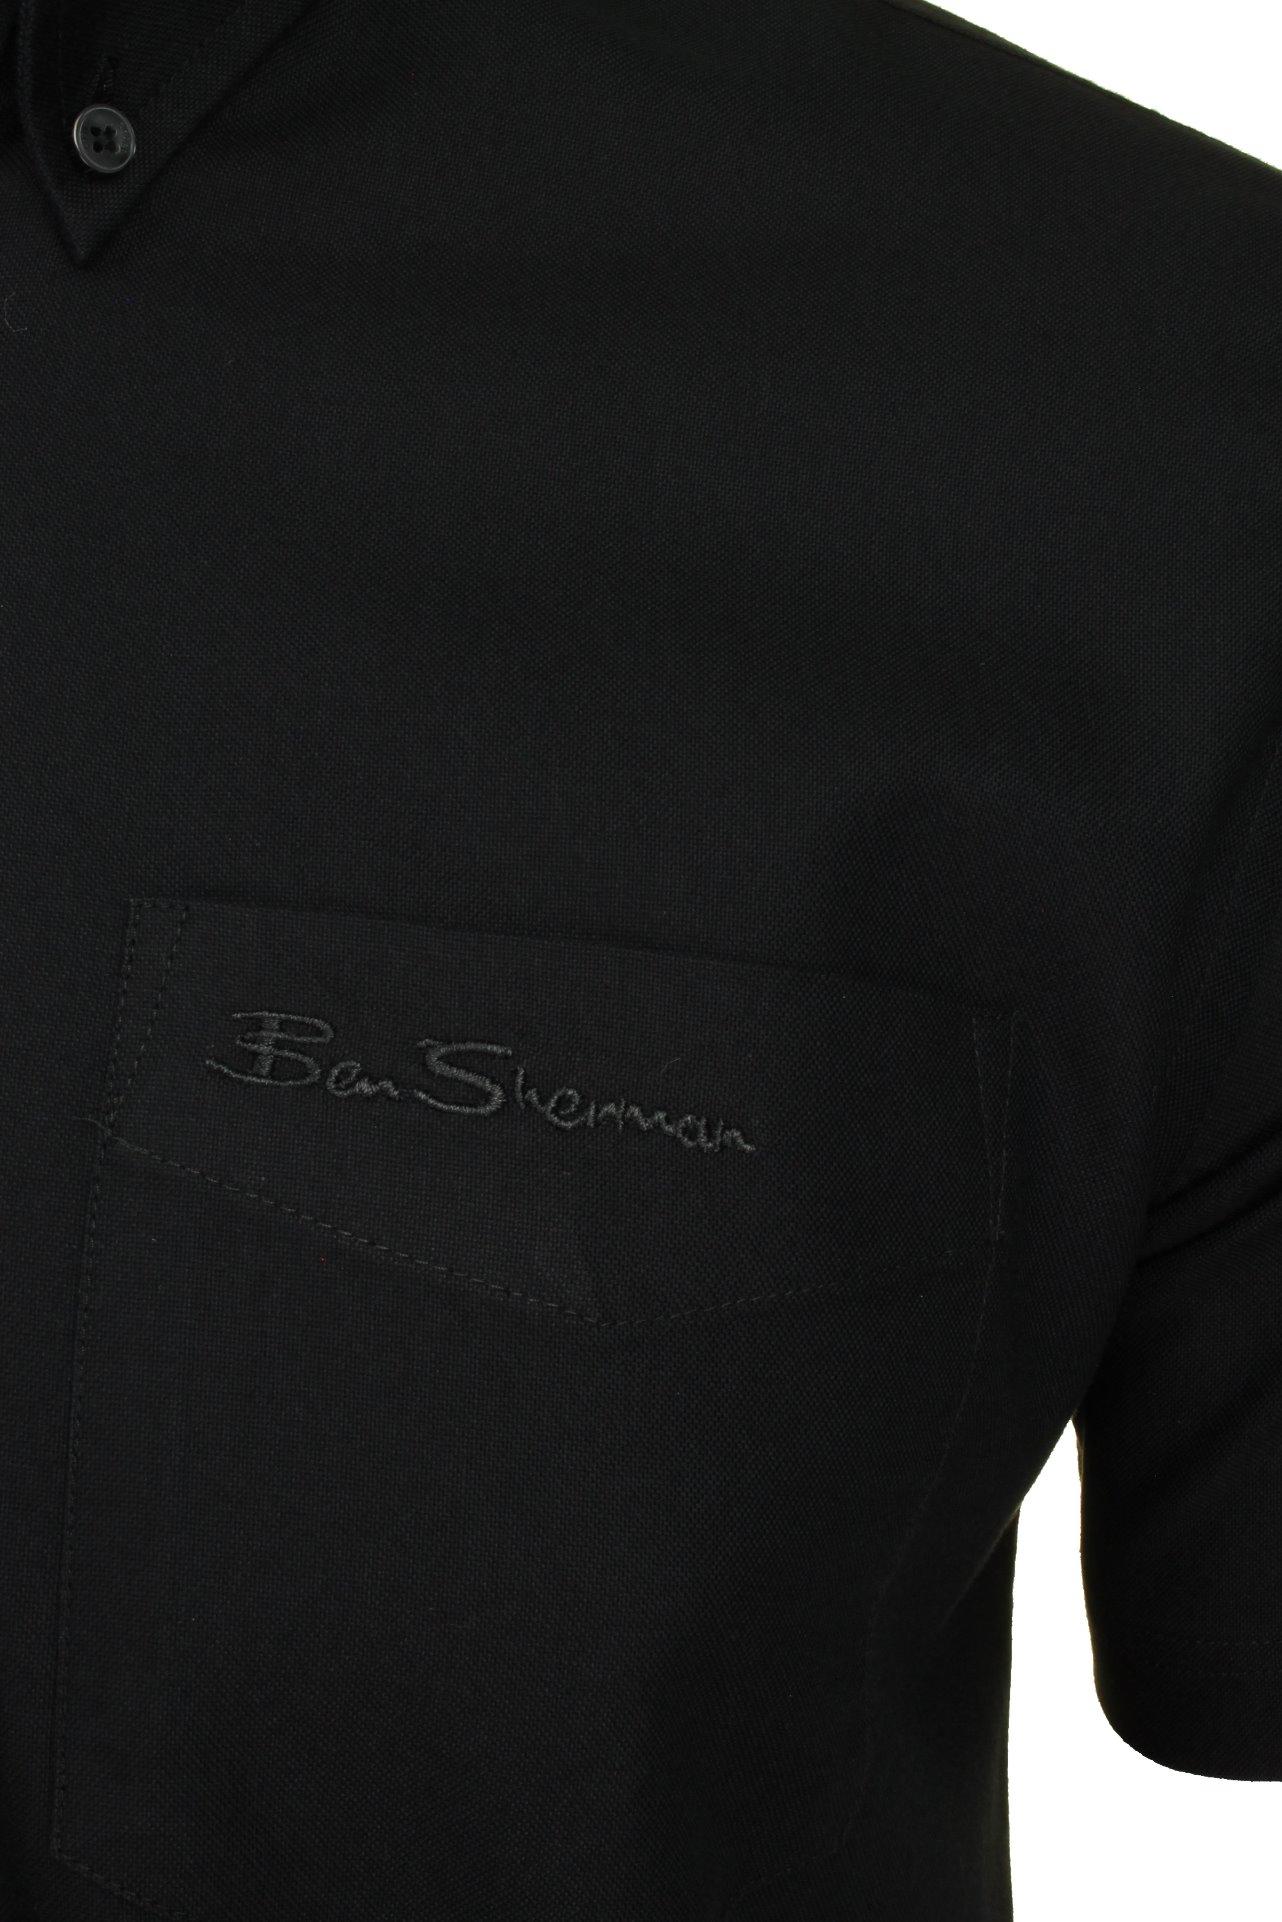 Ben-Sherman-Mens-Oxford-Shirt-Short-Sleeve thumbnail 7